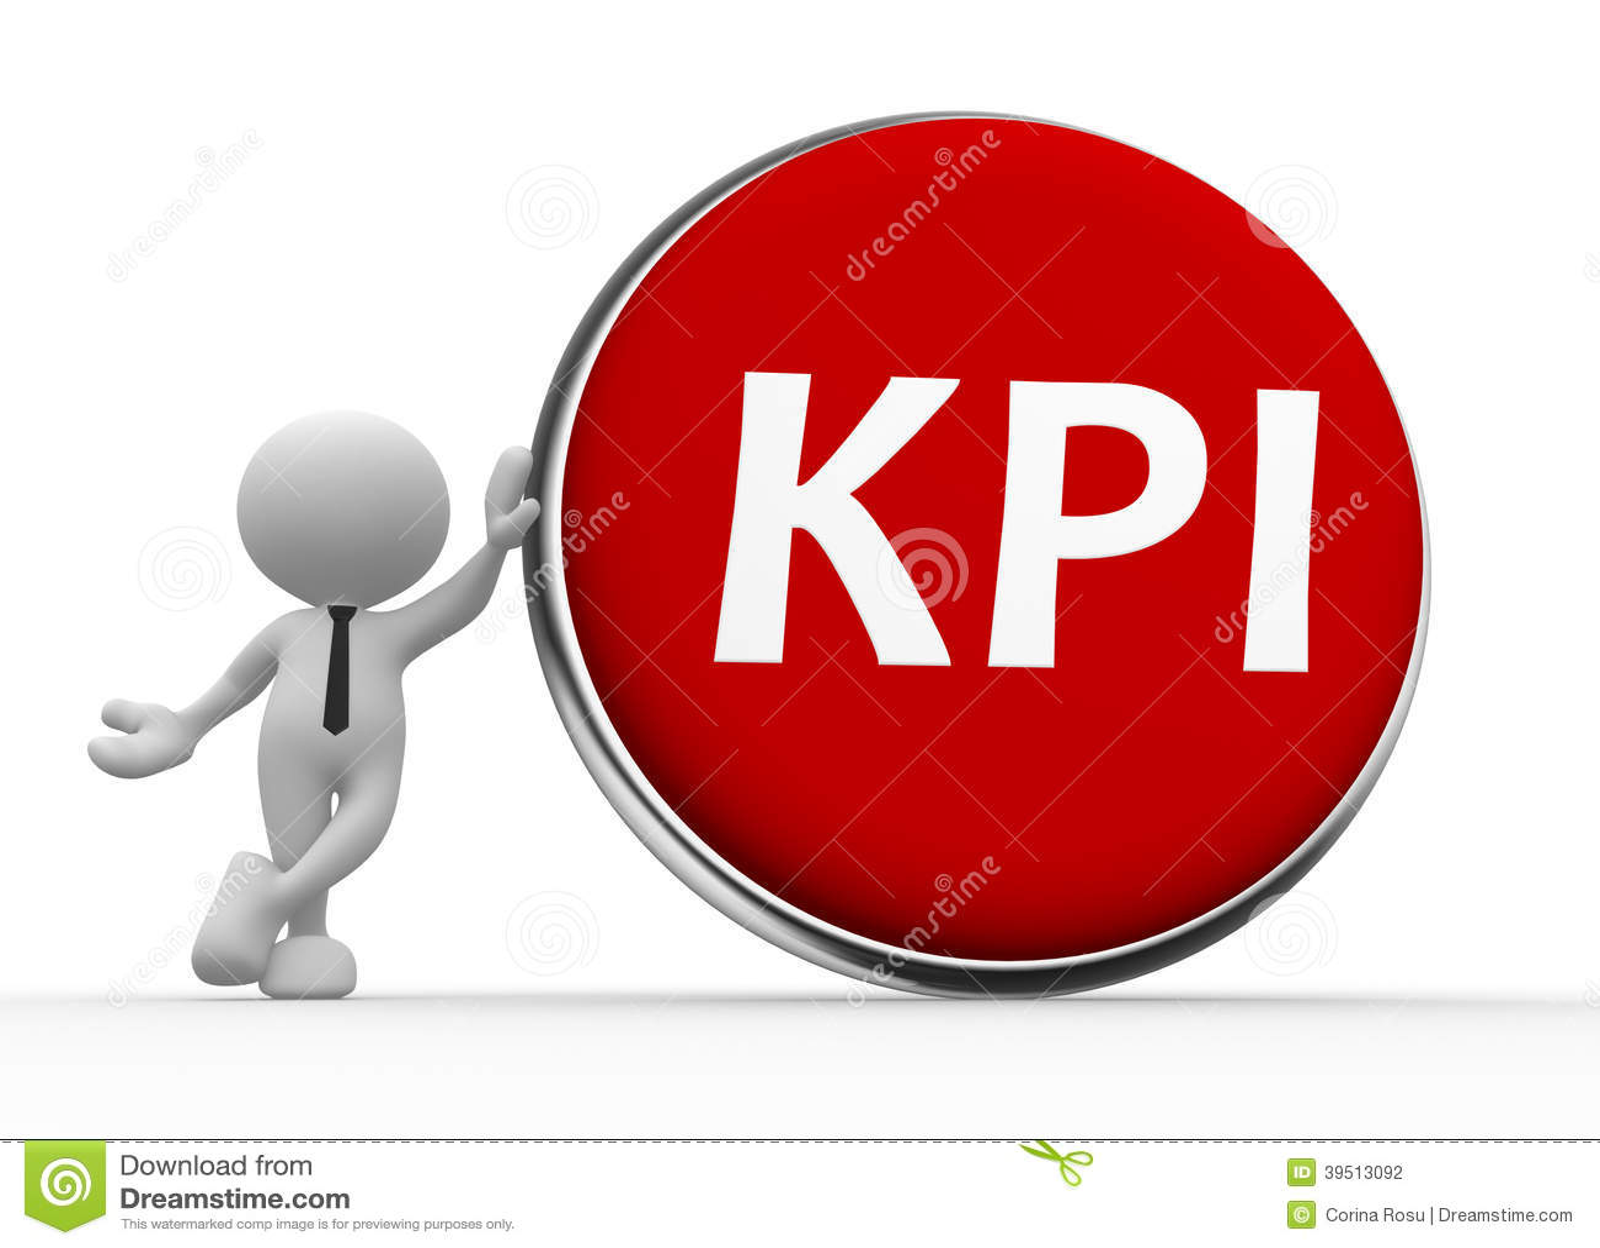 kpi   key performance indicator   button stock ice cream clip art images ice cream clipart green